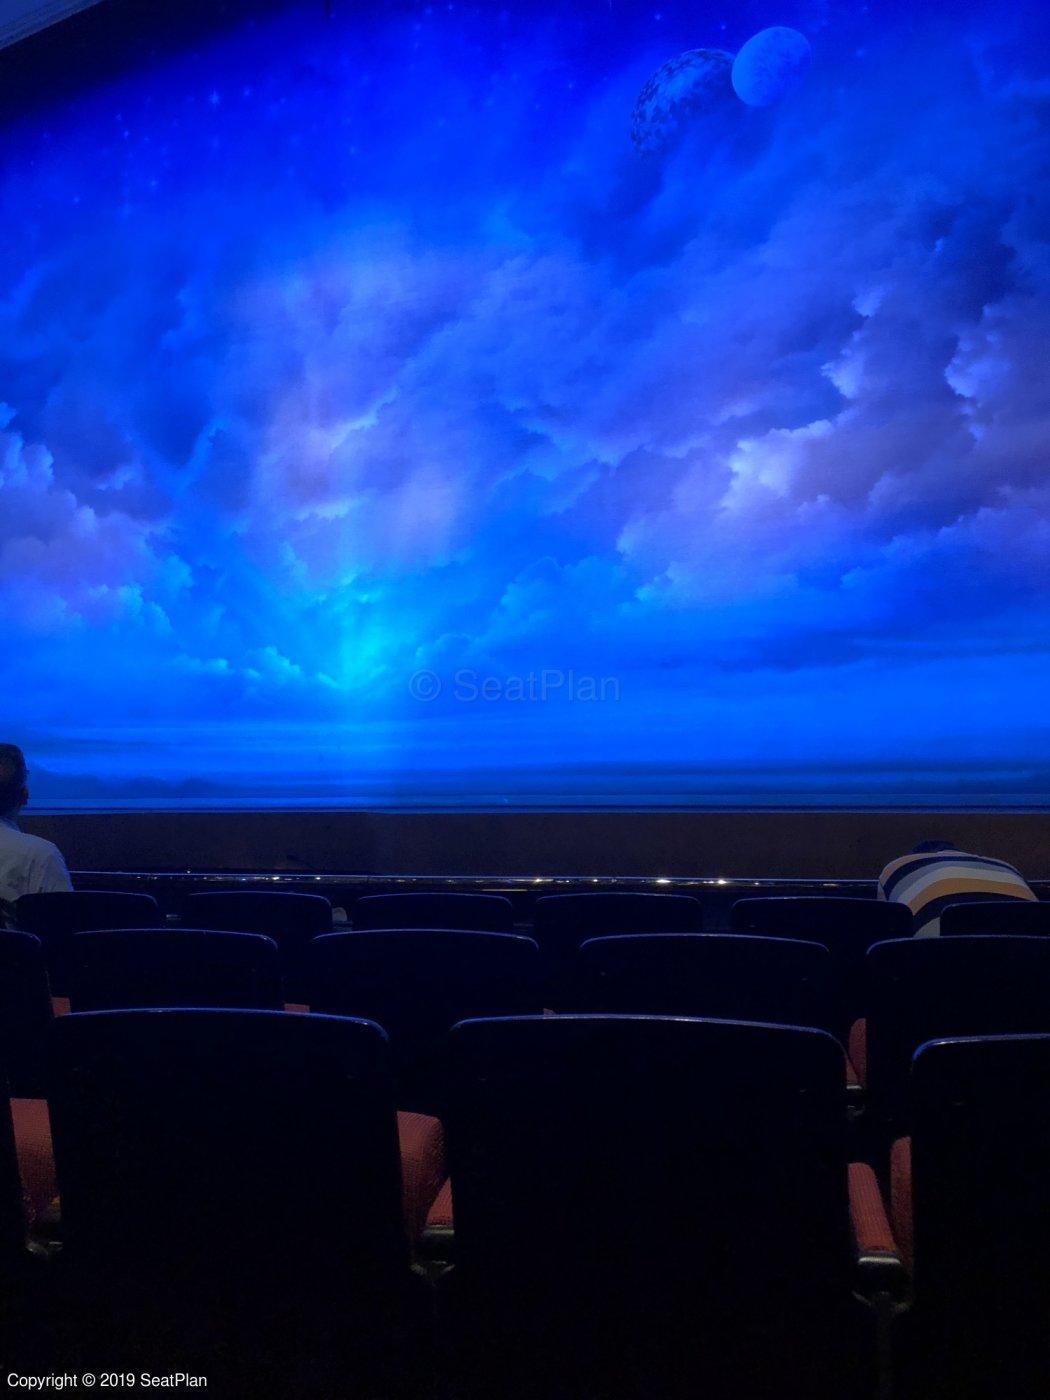 Prince of Wales Theatre London Seating Plan & Reviews   SeatPlan